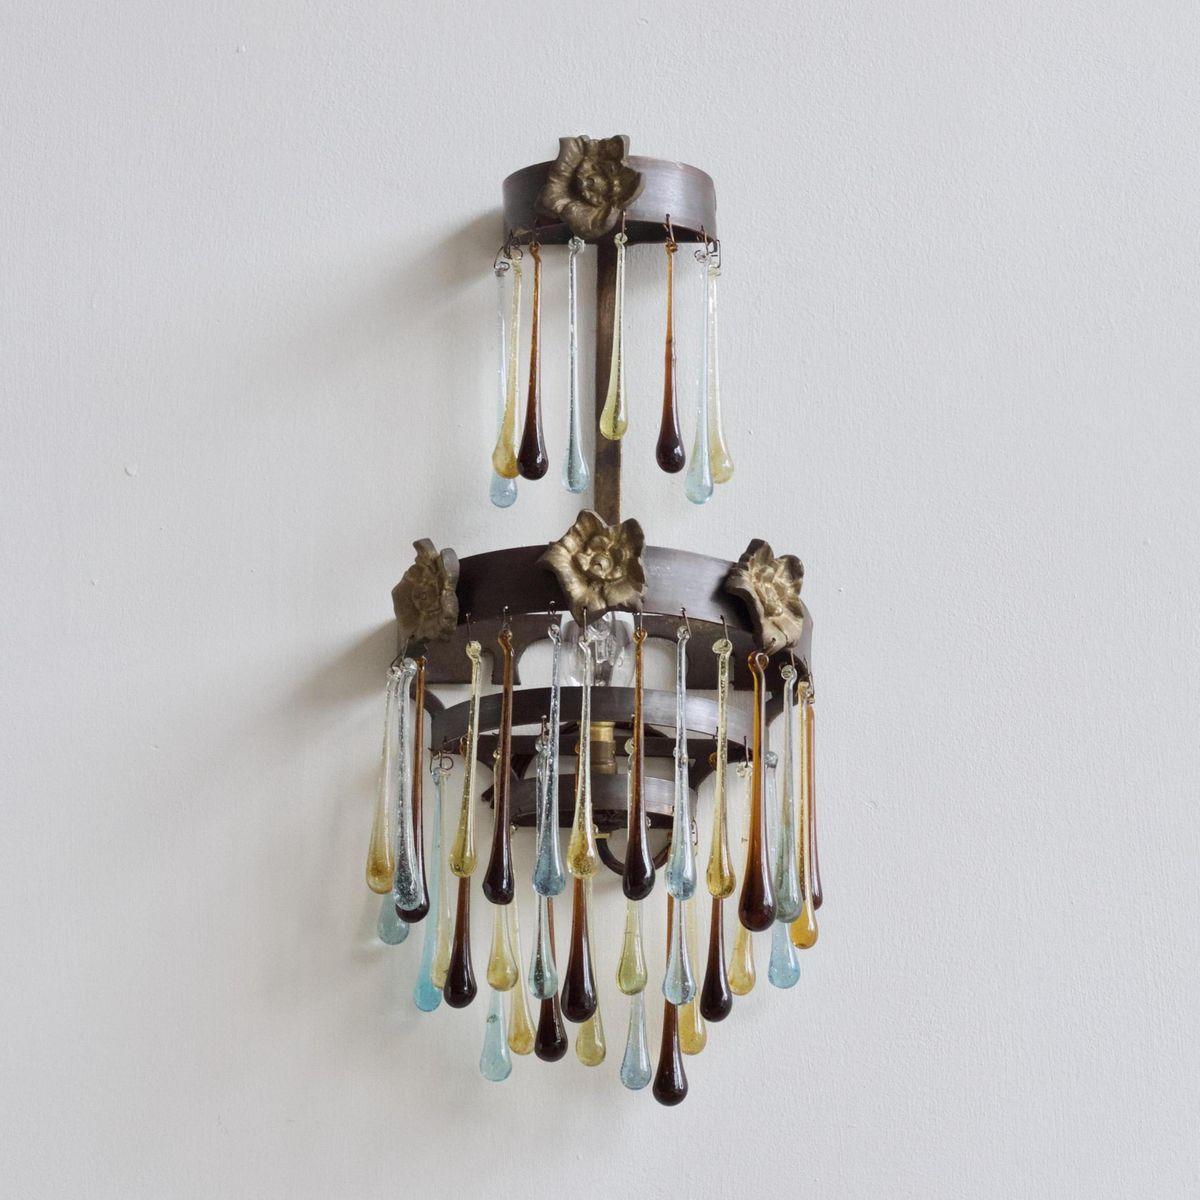 wandlampe vintage retro wandleuchte antik wandlampe vintage my lovely home my lovely home. Black Bedroom Furniture Sets. Home Design Ideas